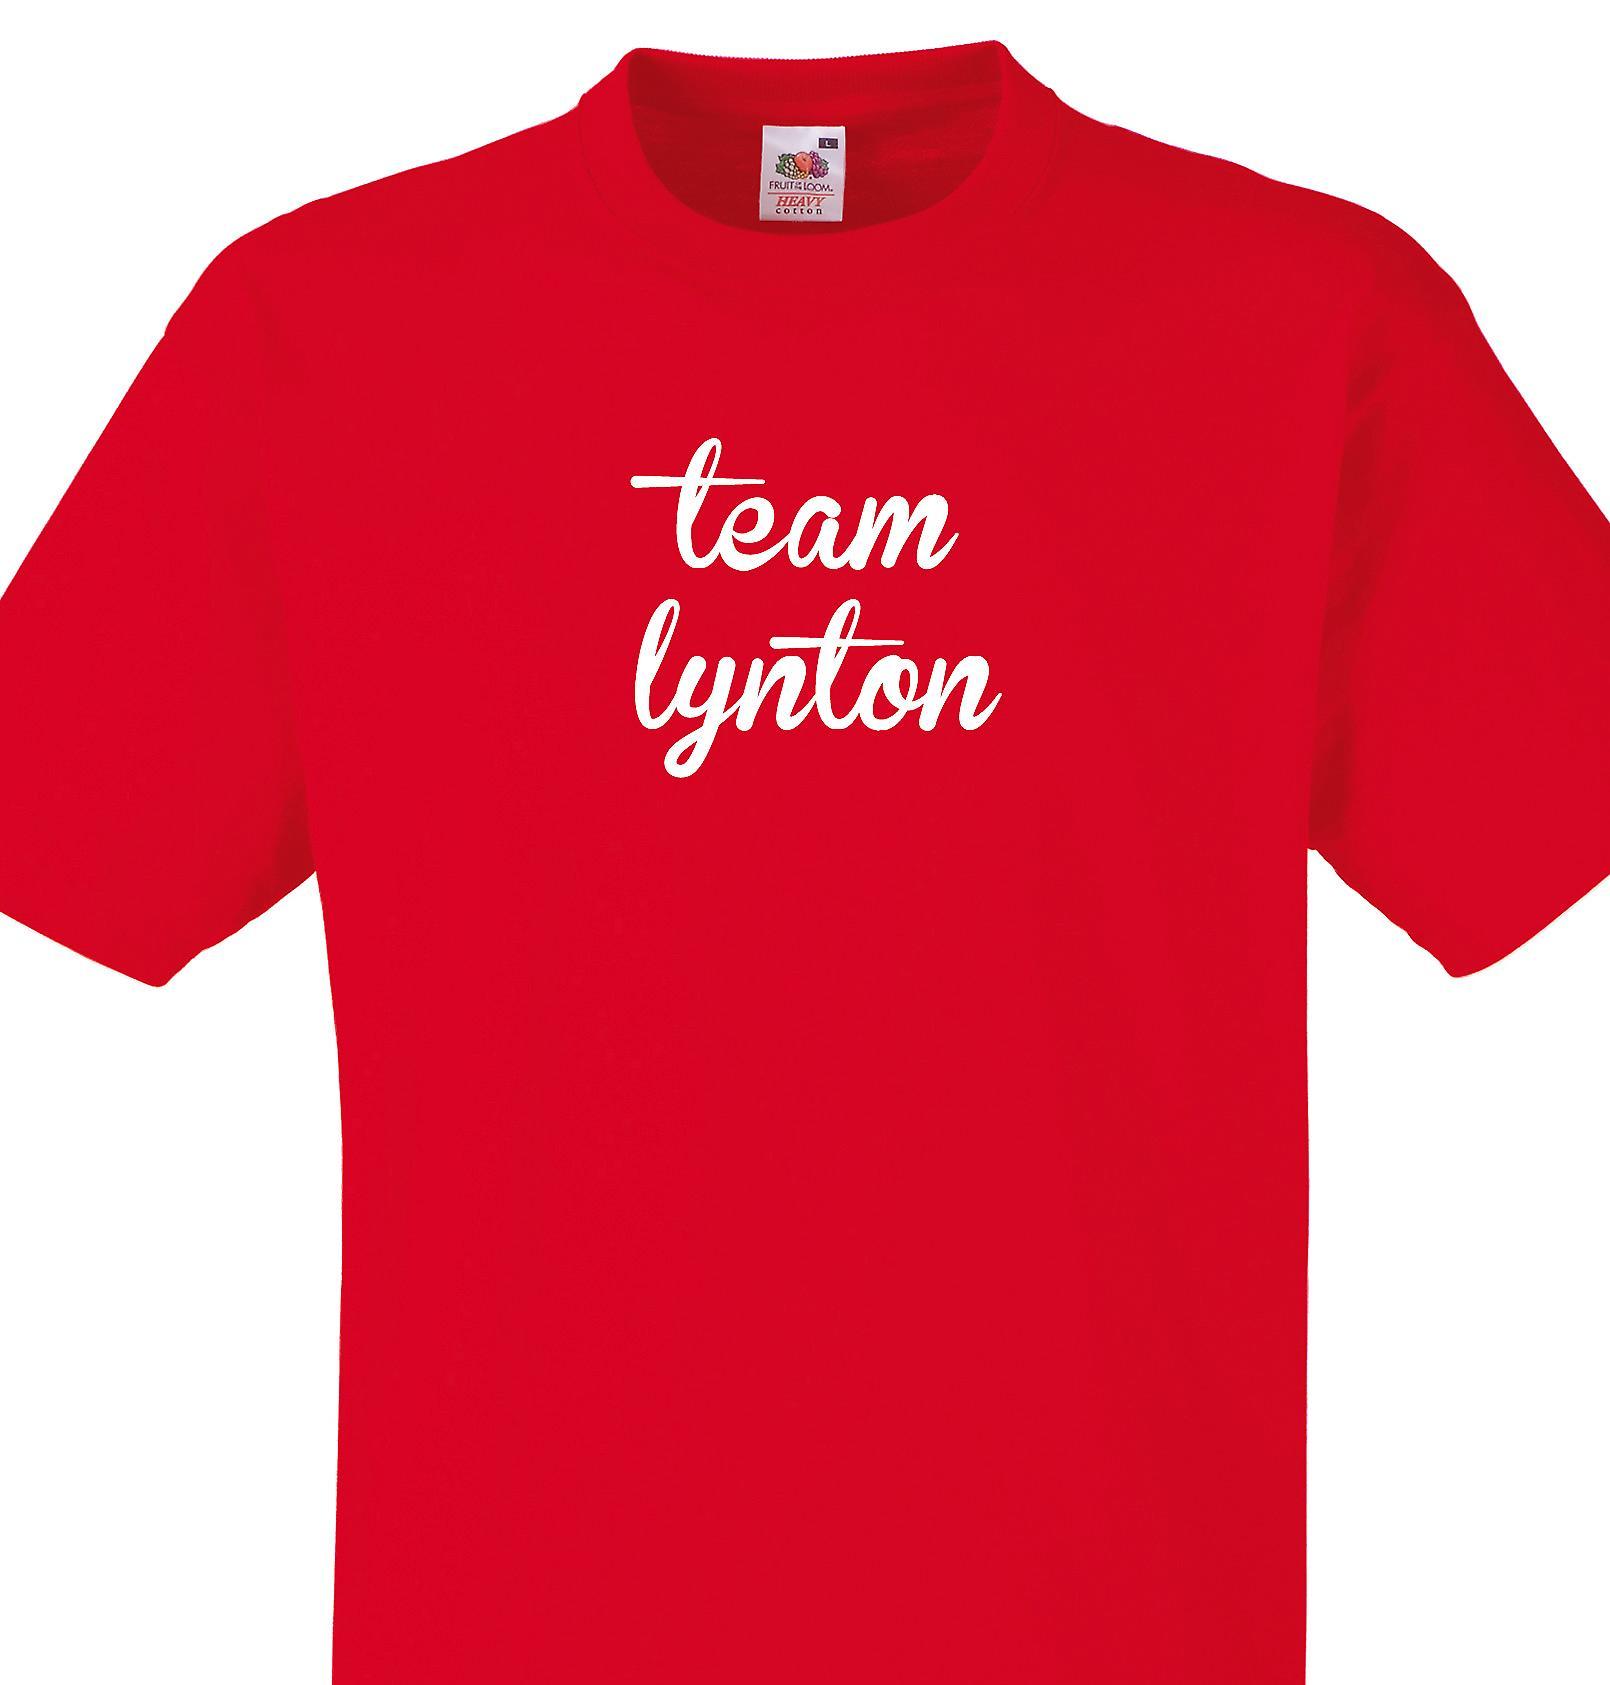 Team Lynton Red T shirt